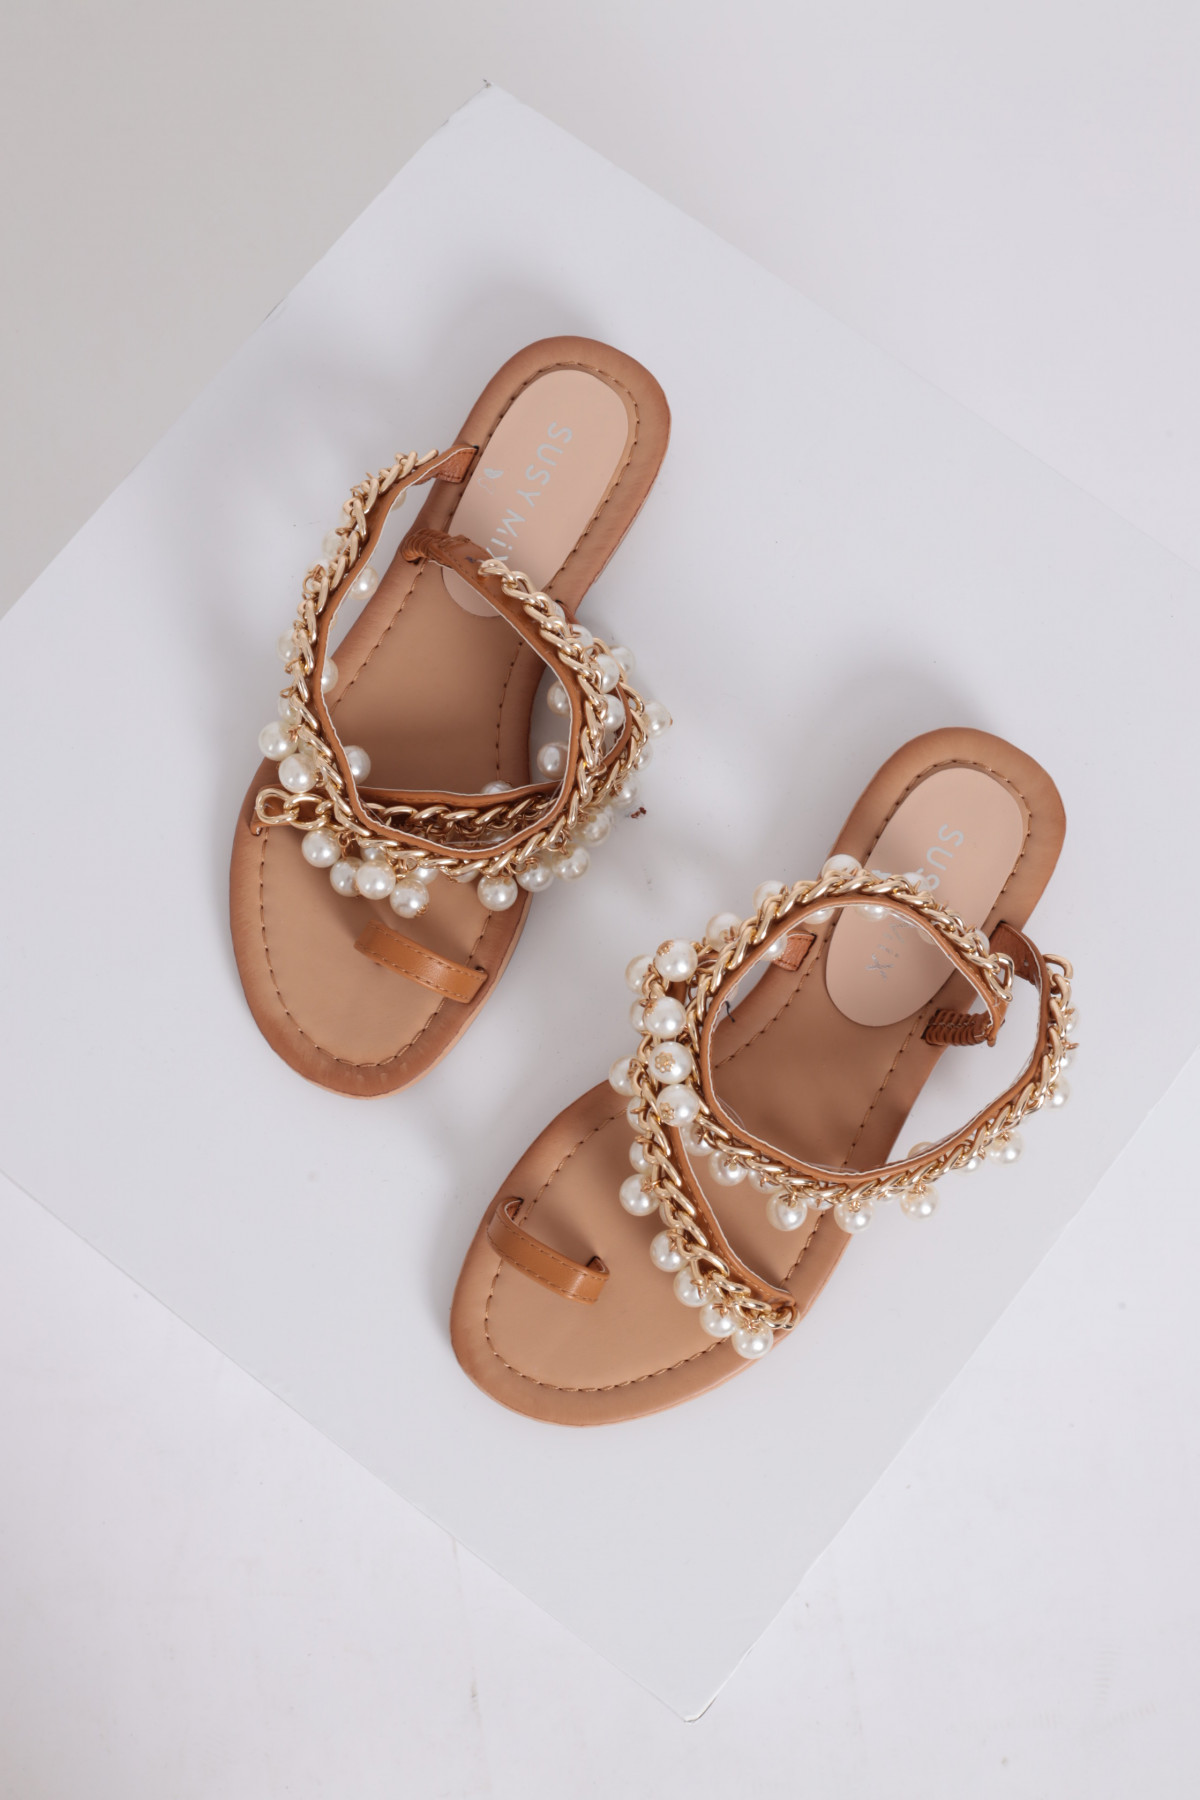 Sandal with Jewel Application